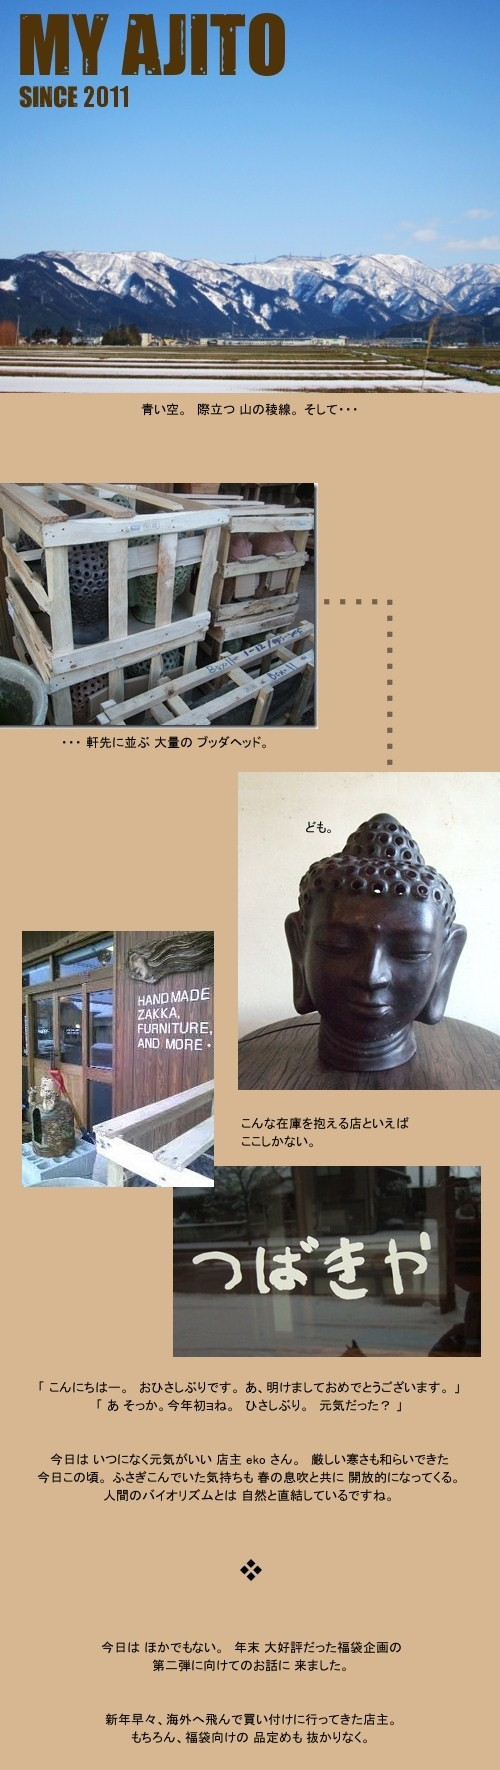 baki_2nd_1.jpg